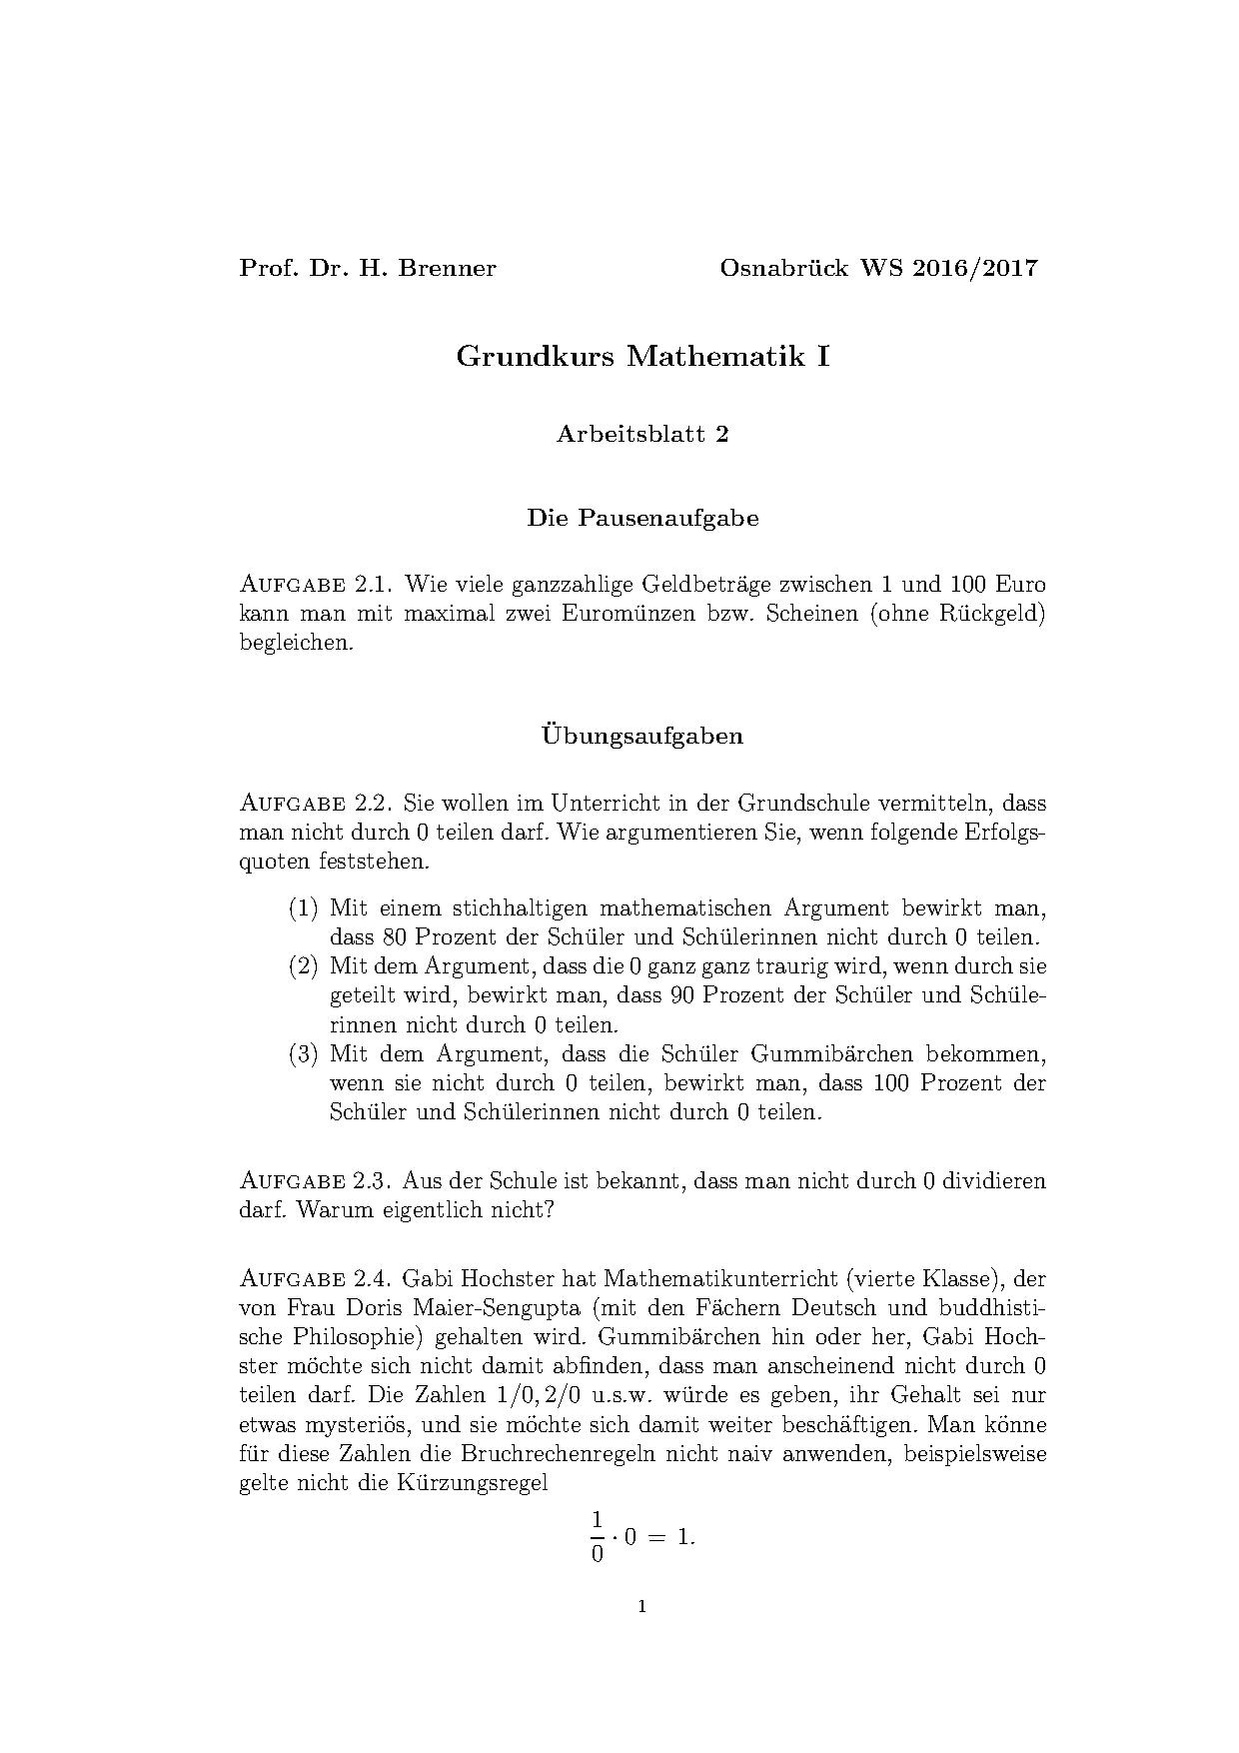 Groß Math 2 Arbeitsblatt Bilder - Übungen Mathe - canhogemriverside.info